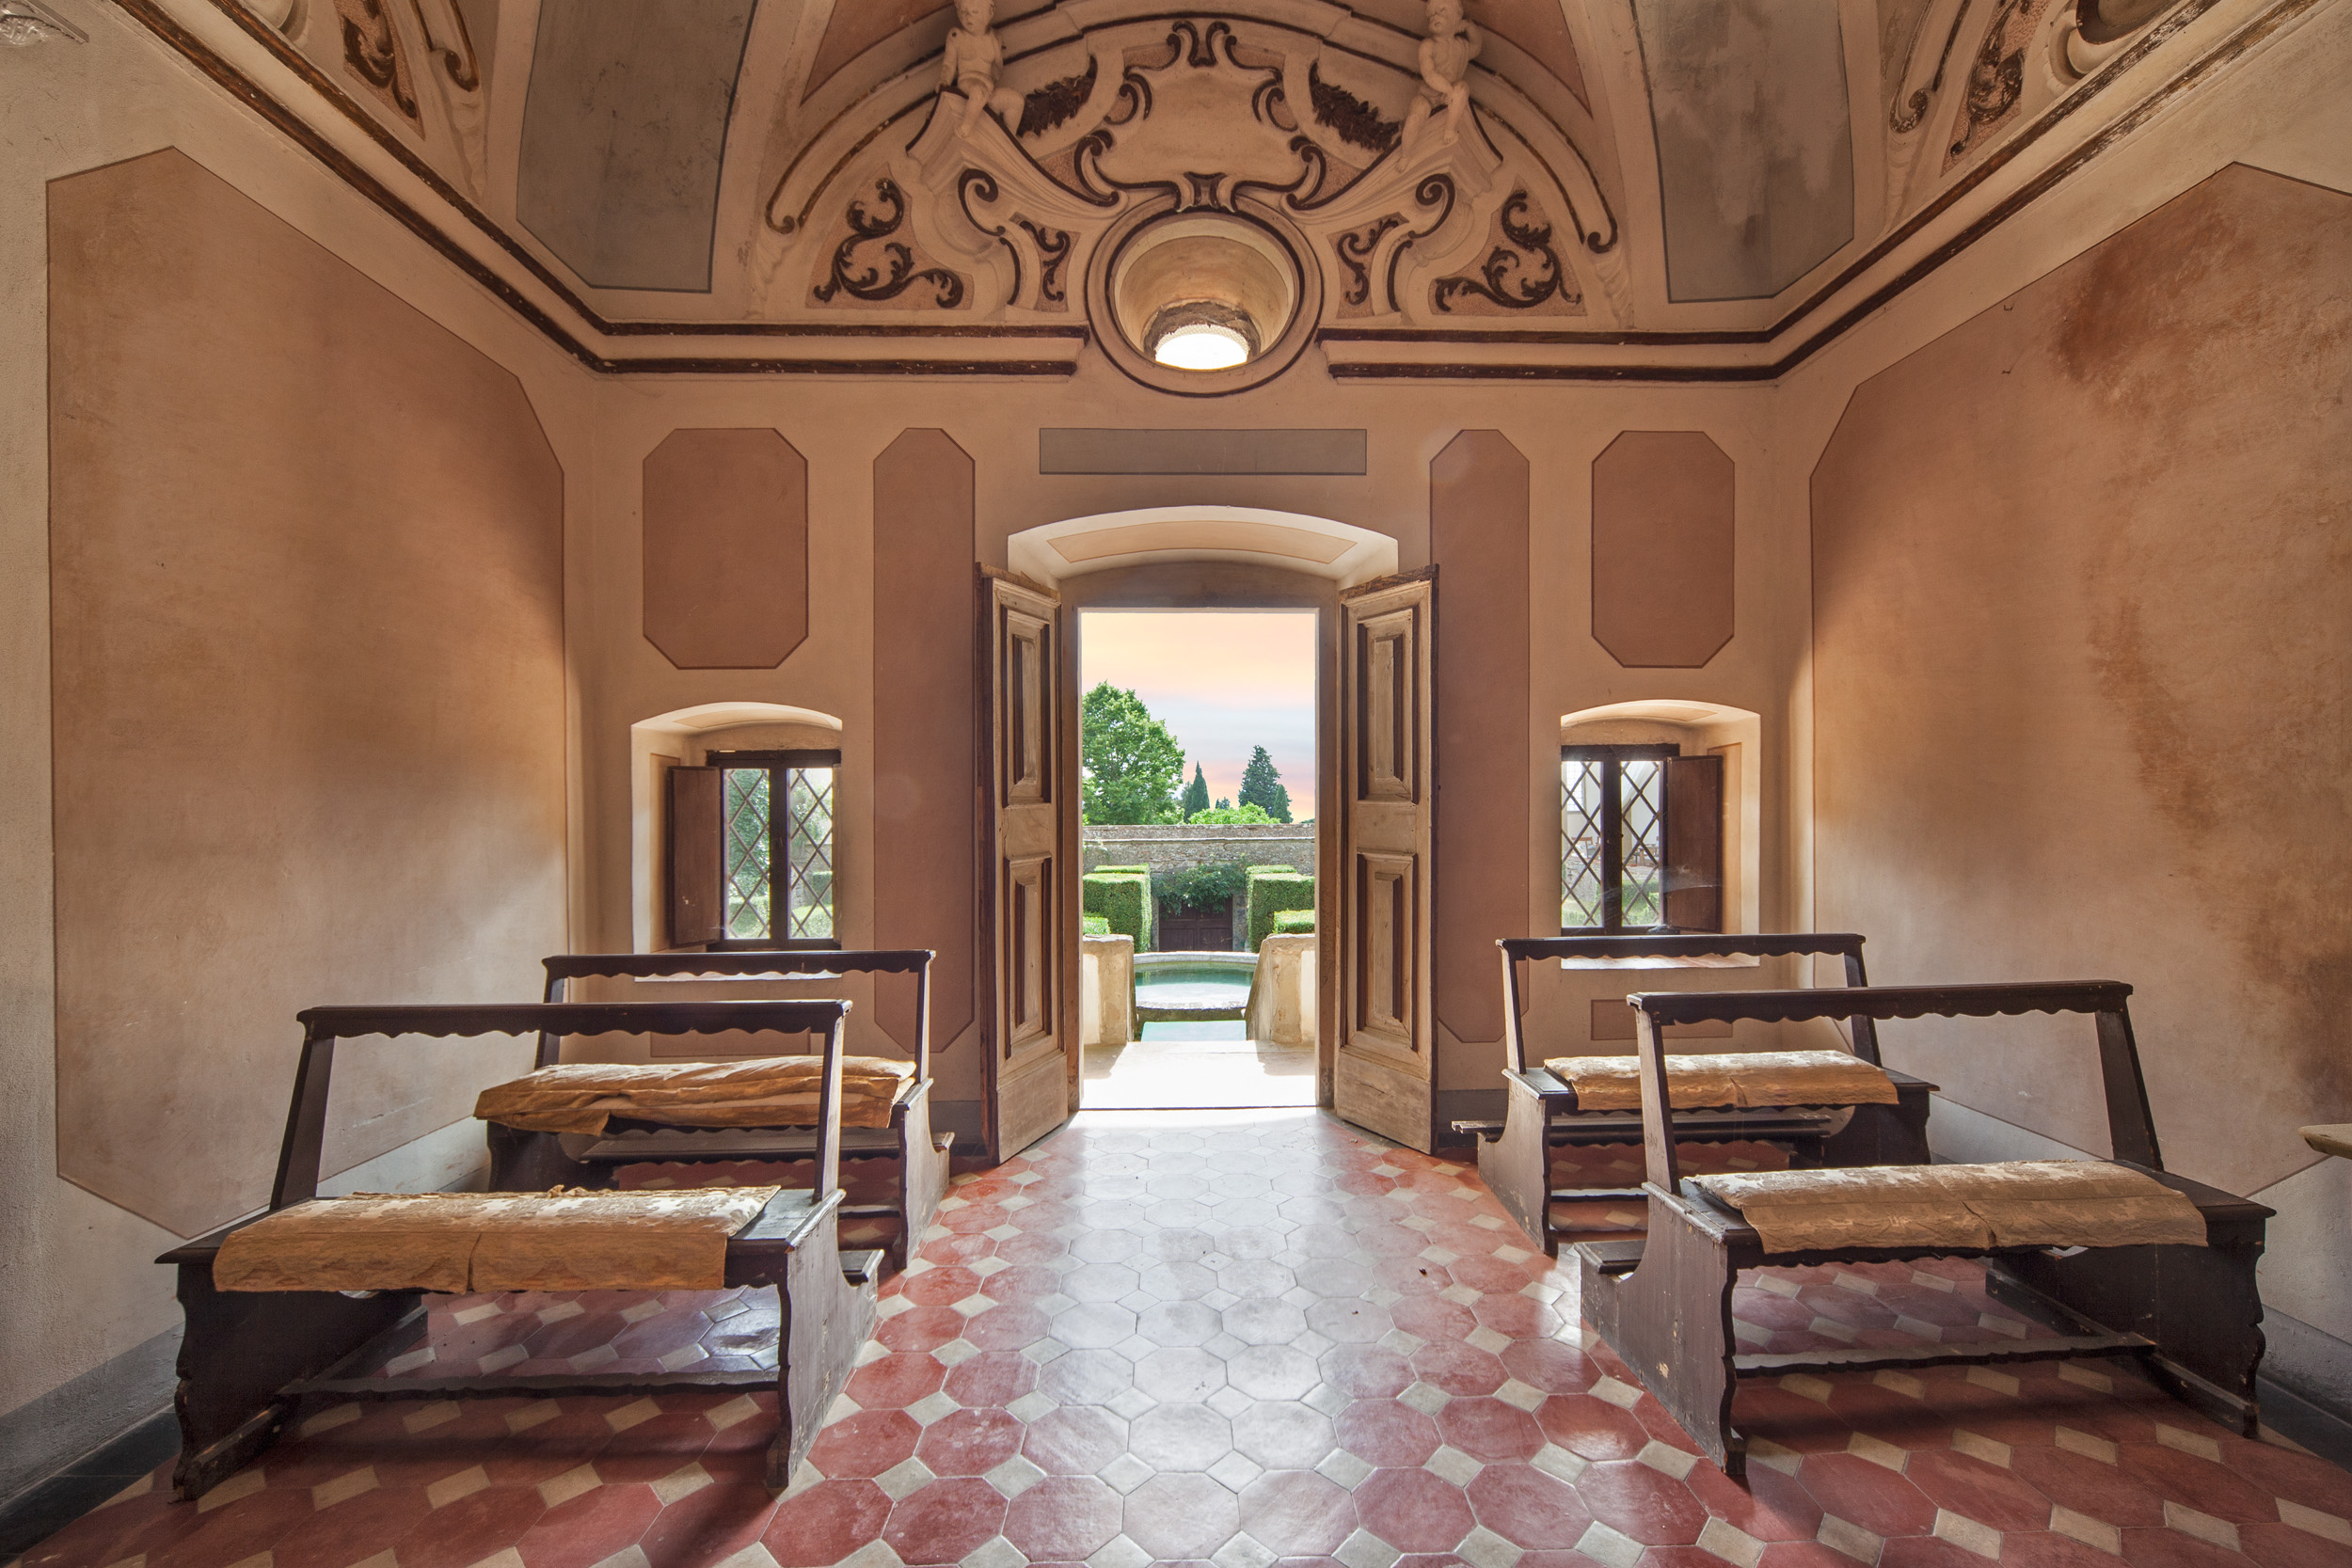 convent_villa_florence_9.jpg